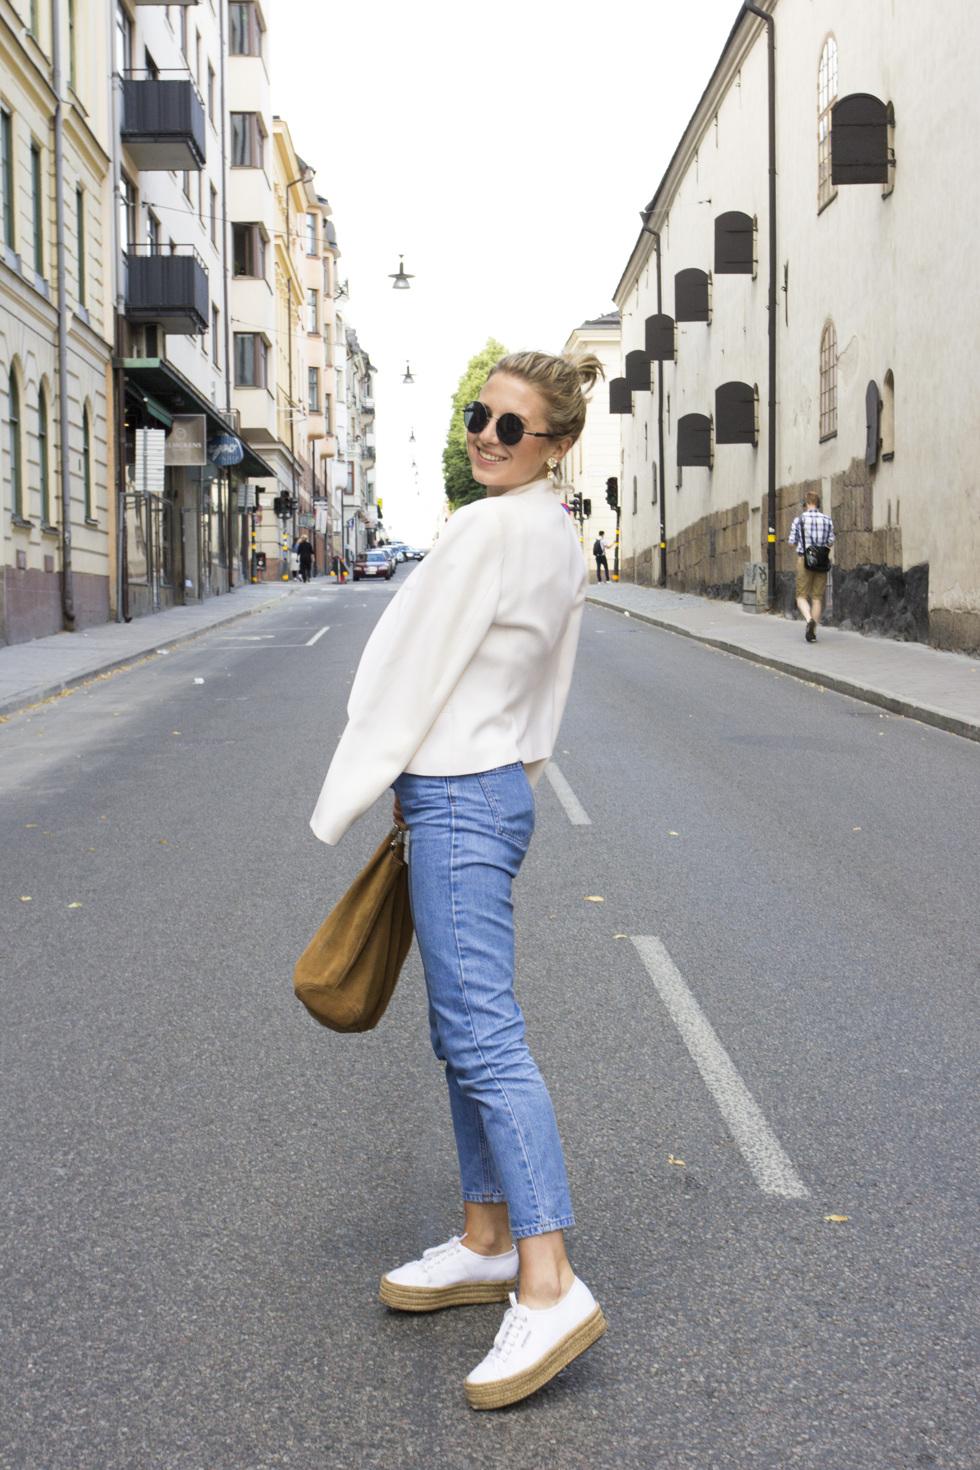 Henrietta_Fromholtz_outfit_4